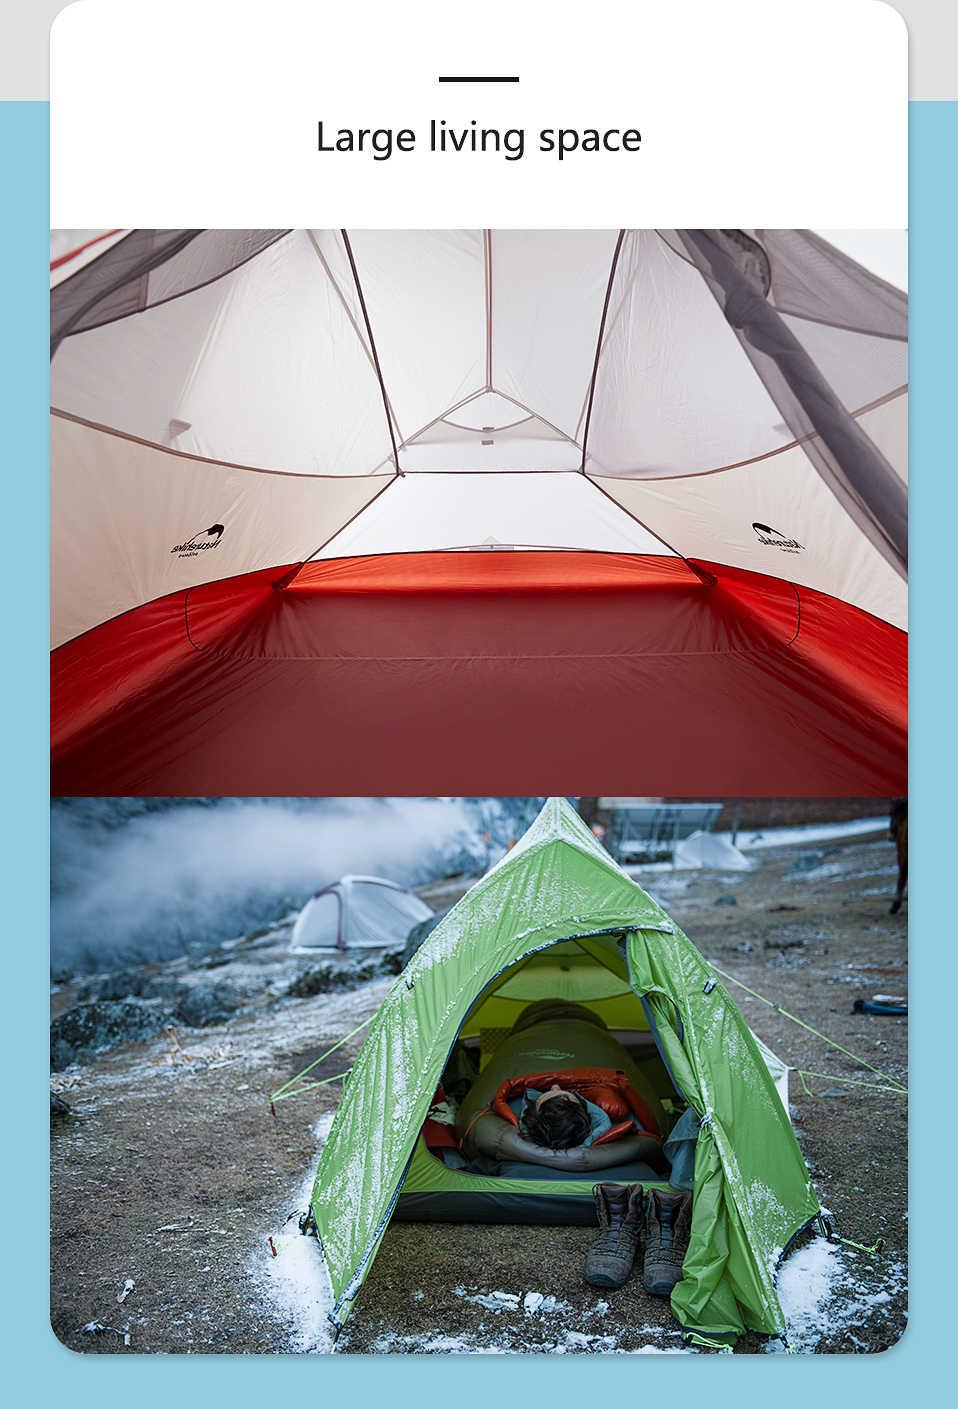 Naturehike سحابة حتى Serie 123 ترقية التخييم خيمة مقاوم للماء في الهواء الطلق خيمة صغيرة للمعسكرات والشواطئ يمكن حملها في شنطة اليد 20D 210T النايلون الظهر خيمة مع حصيرة مجانية